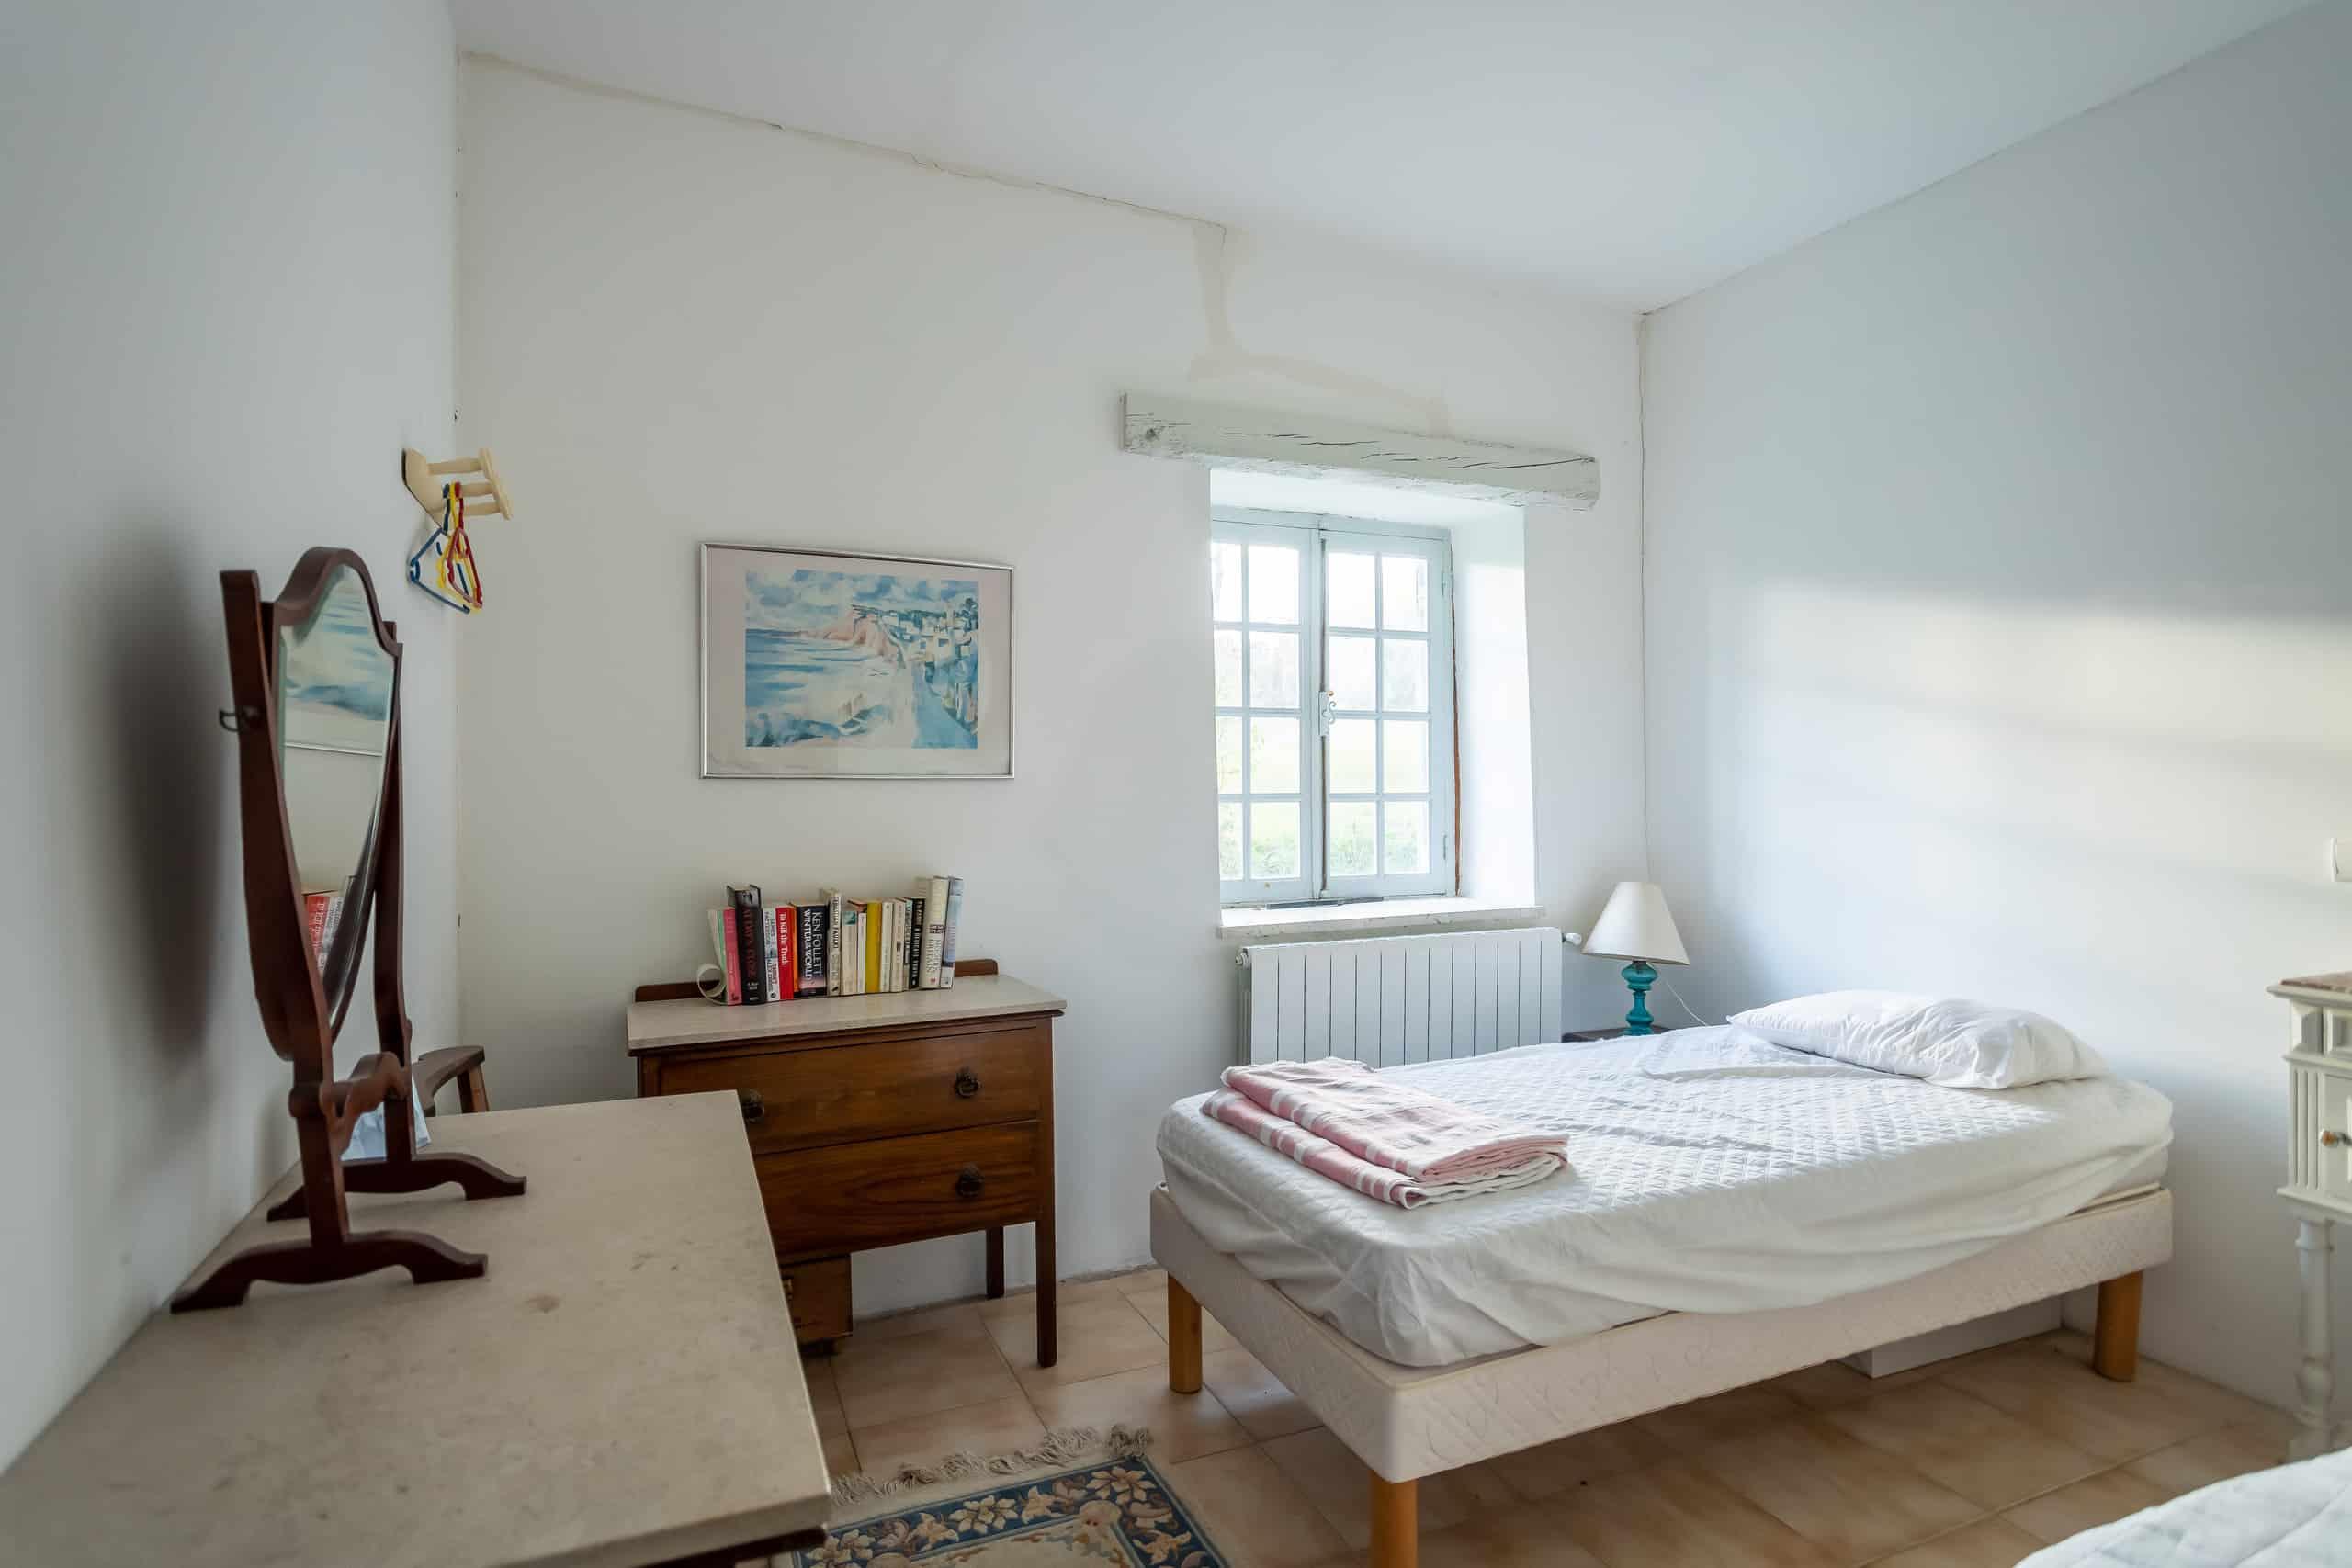 Bedroom-small-WMC026